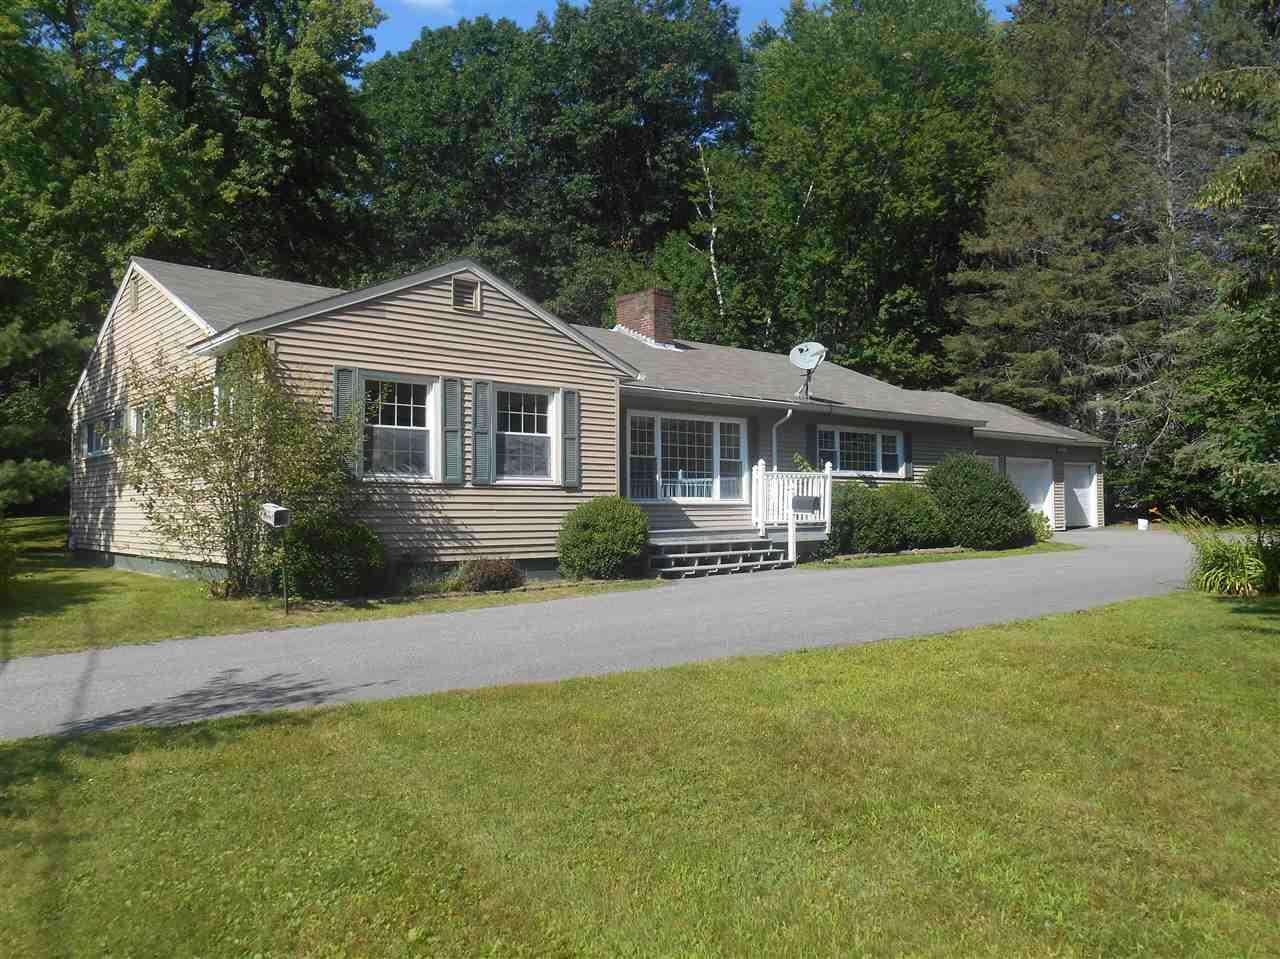 12 LINDEN AVE, TILTON, NH — MLS# 4651173 — Better Homes ... Tilton Nh Homes For Sale Photos